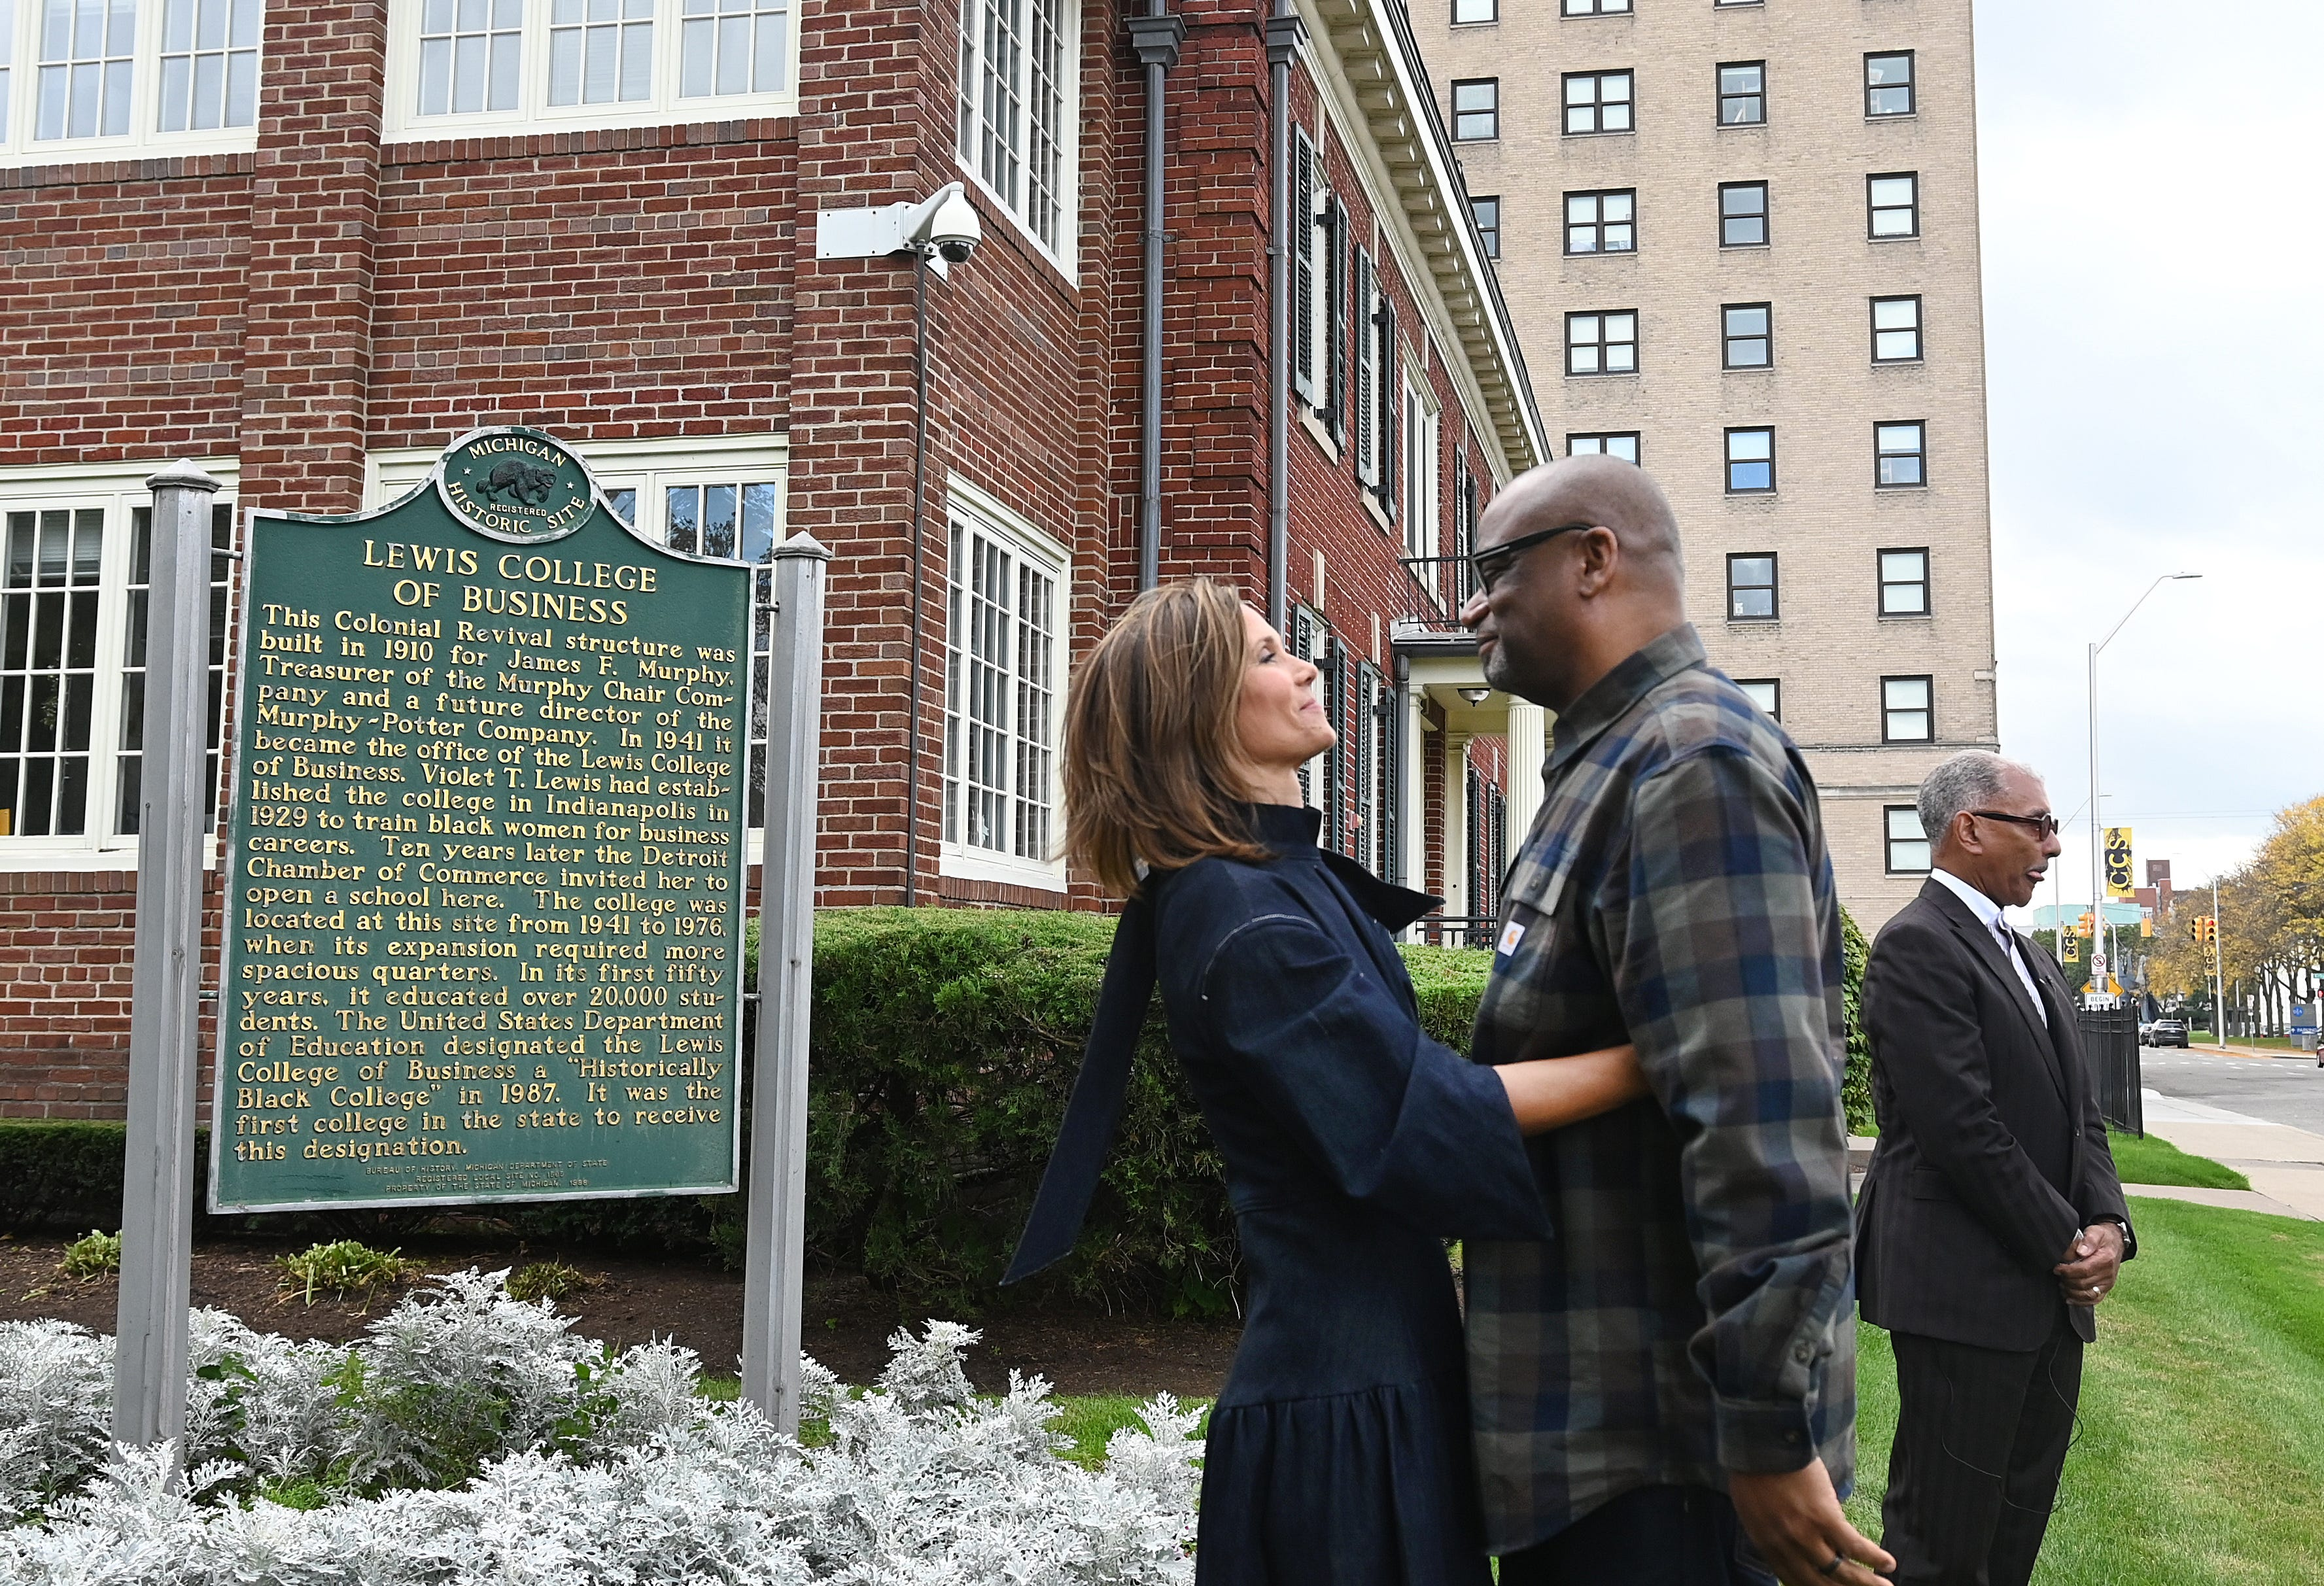 Portland footwear designer proposes to reopen closed Detroit Black college